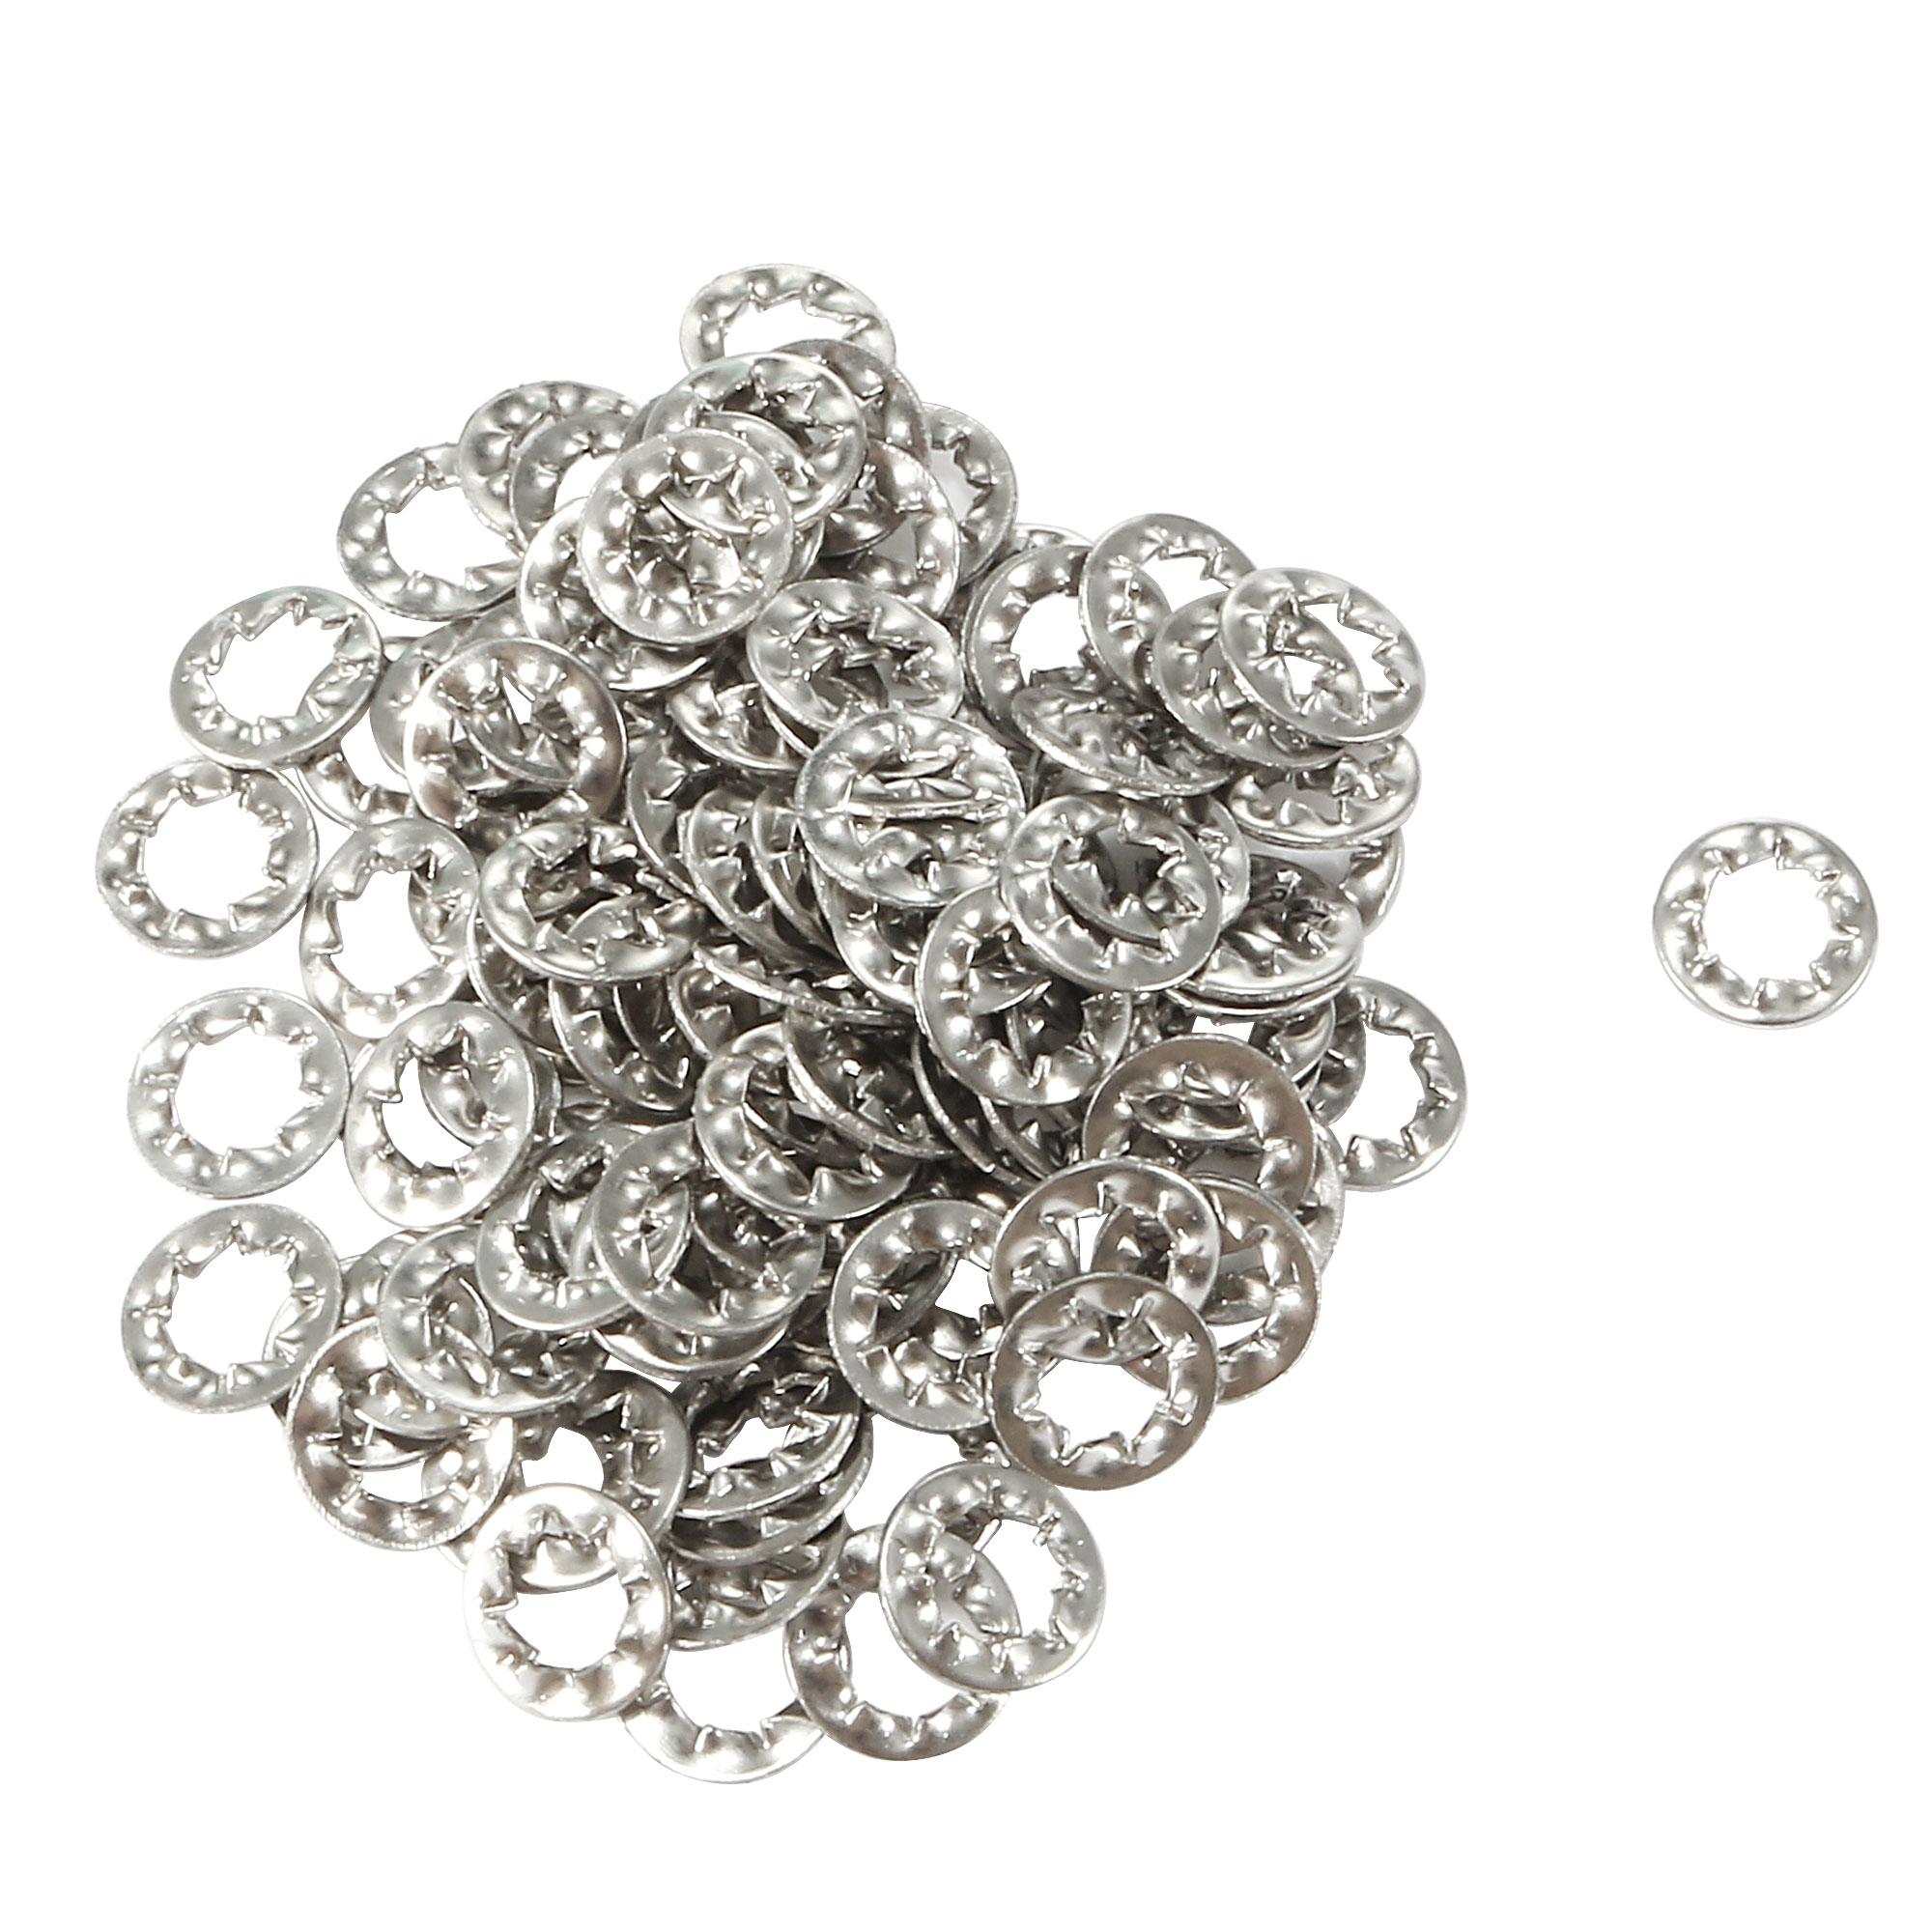 M5 304 Stainless Steel Internal Star Lock Washers 100 Pcs